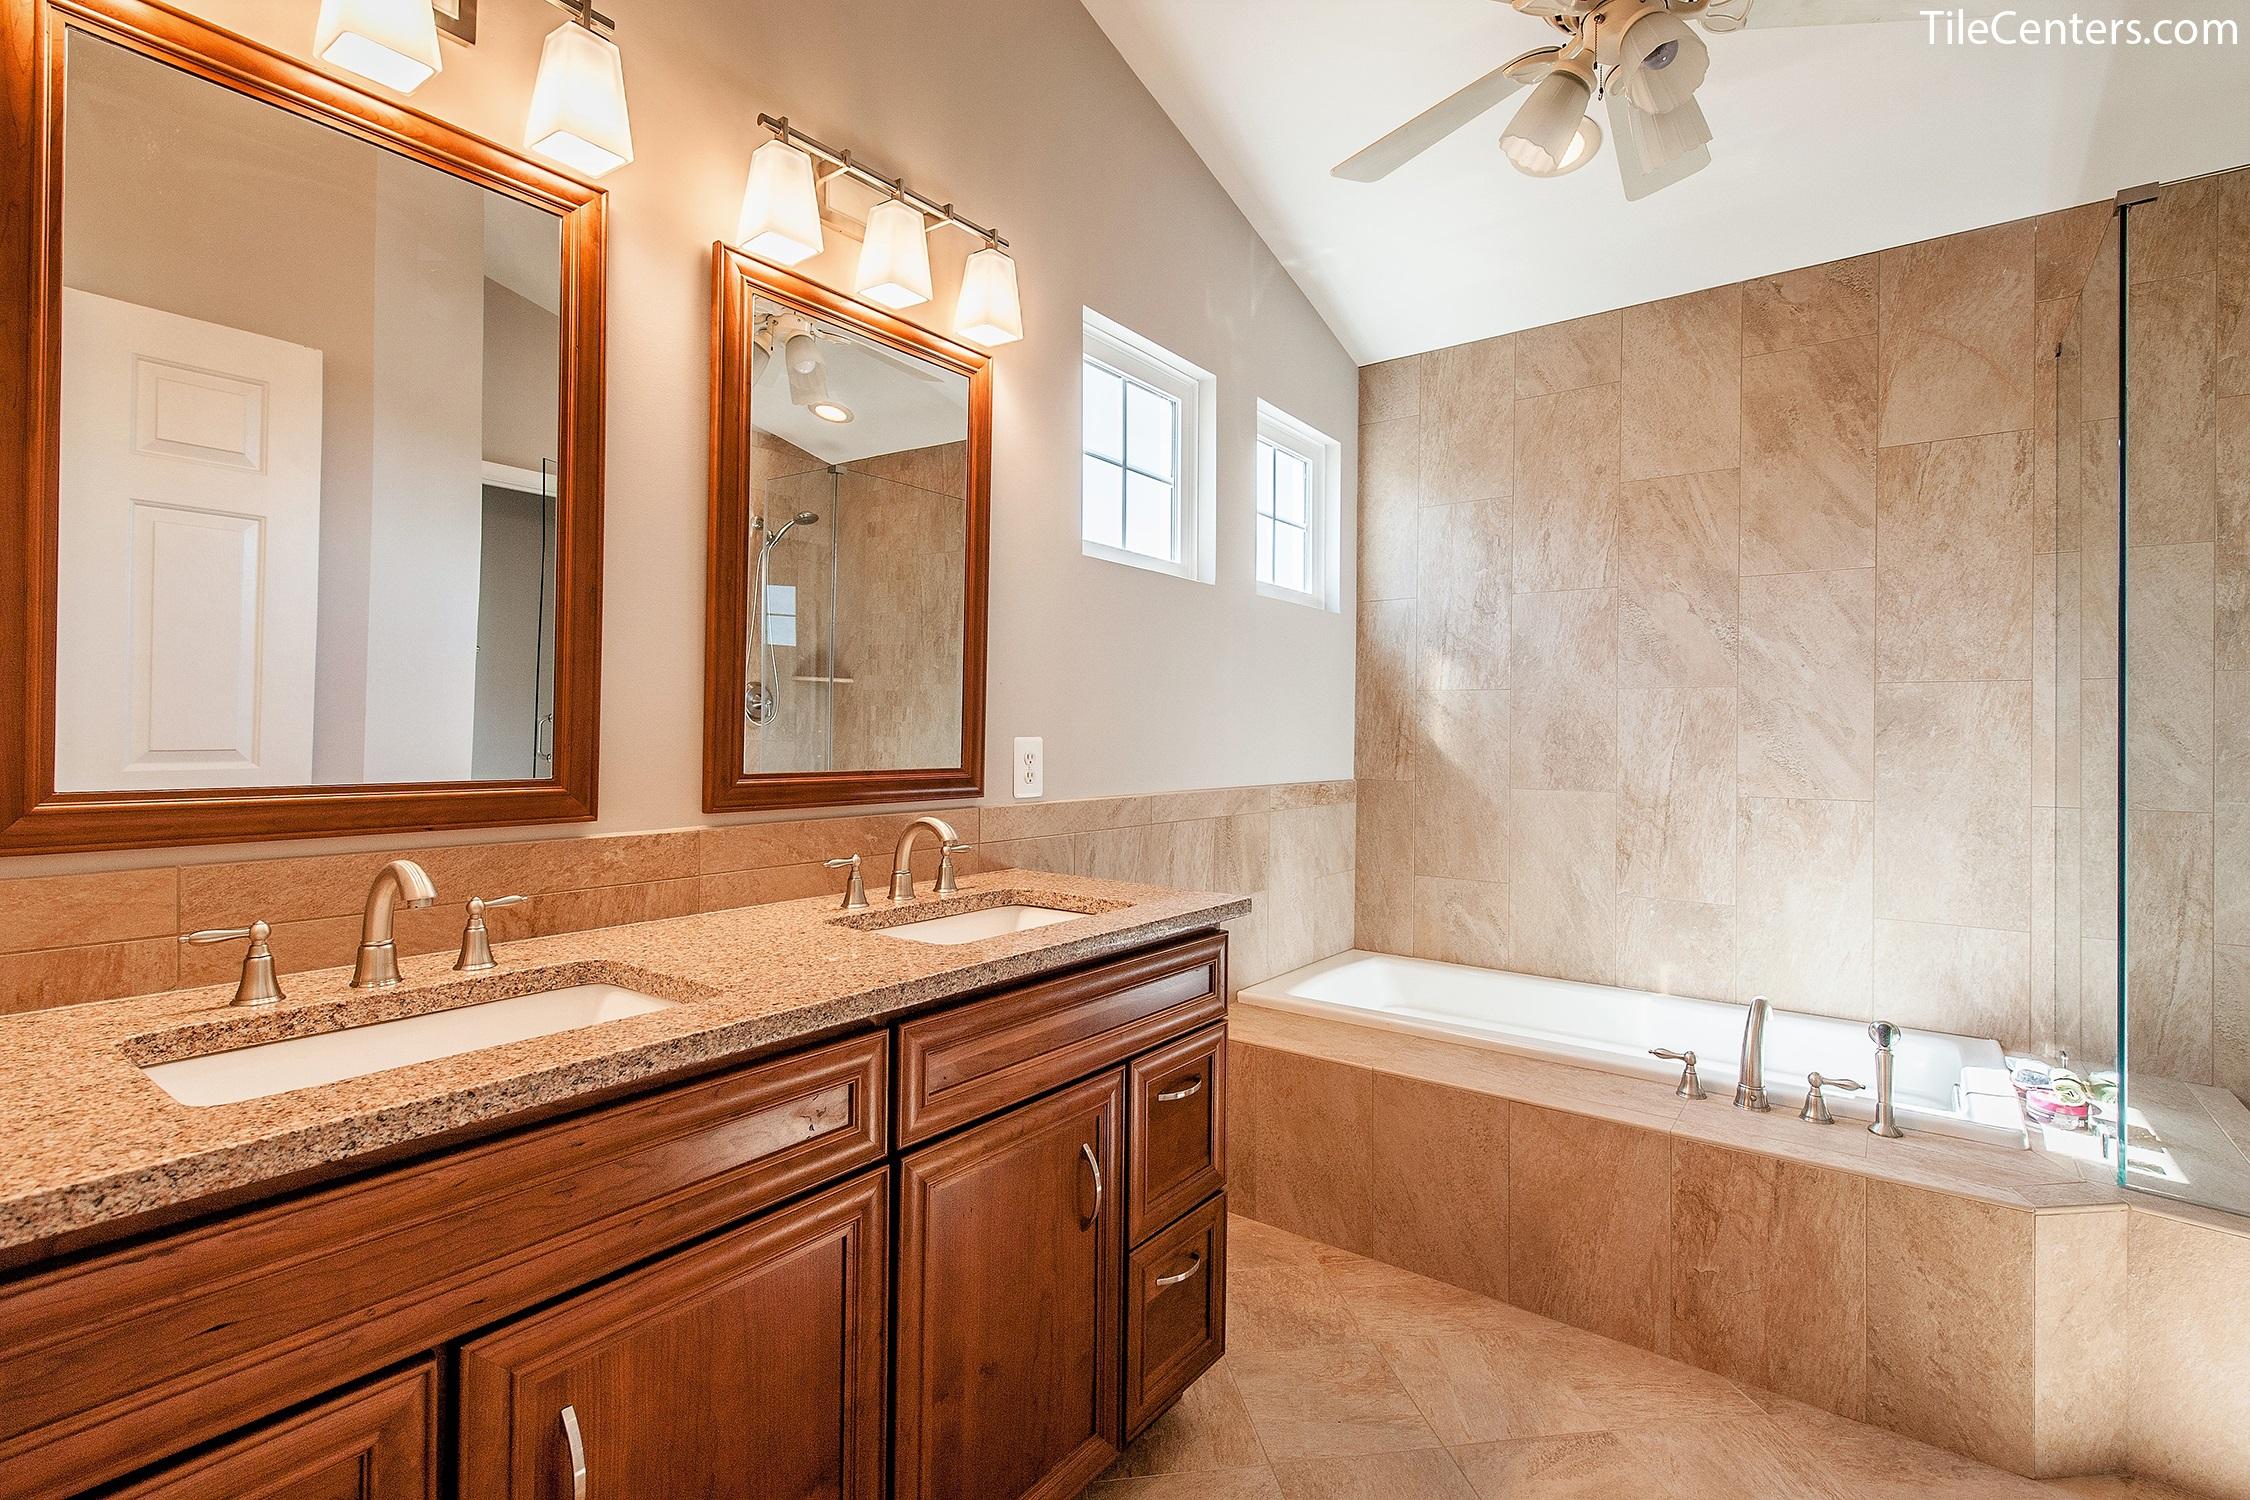 Bathroom kinsbridge terrace mount airy md 21771 tile - Bathroom remodeling gaithersburg md ...